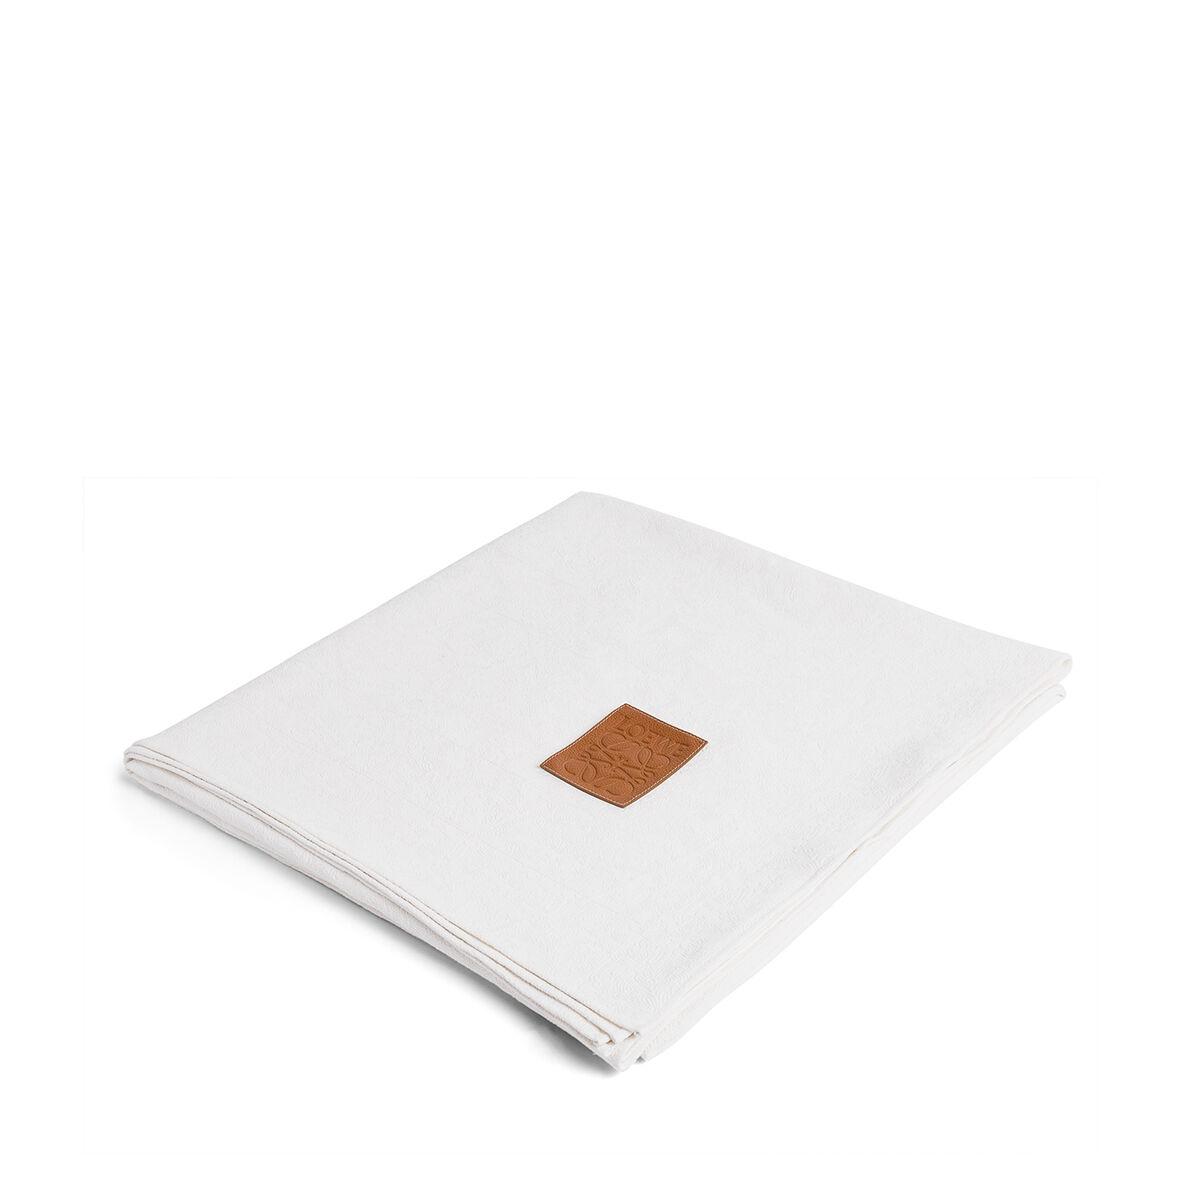 LOEWE Blanket ホワイト all